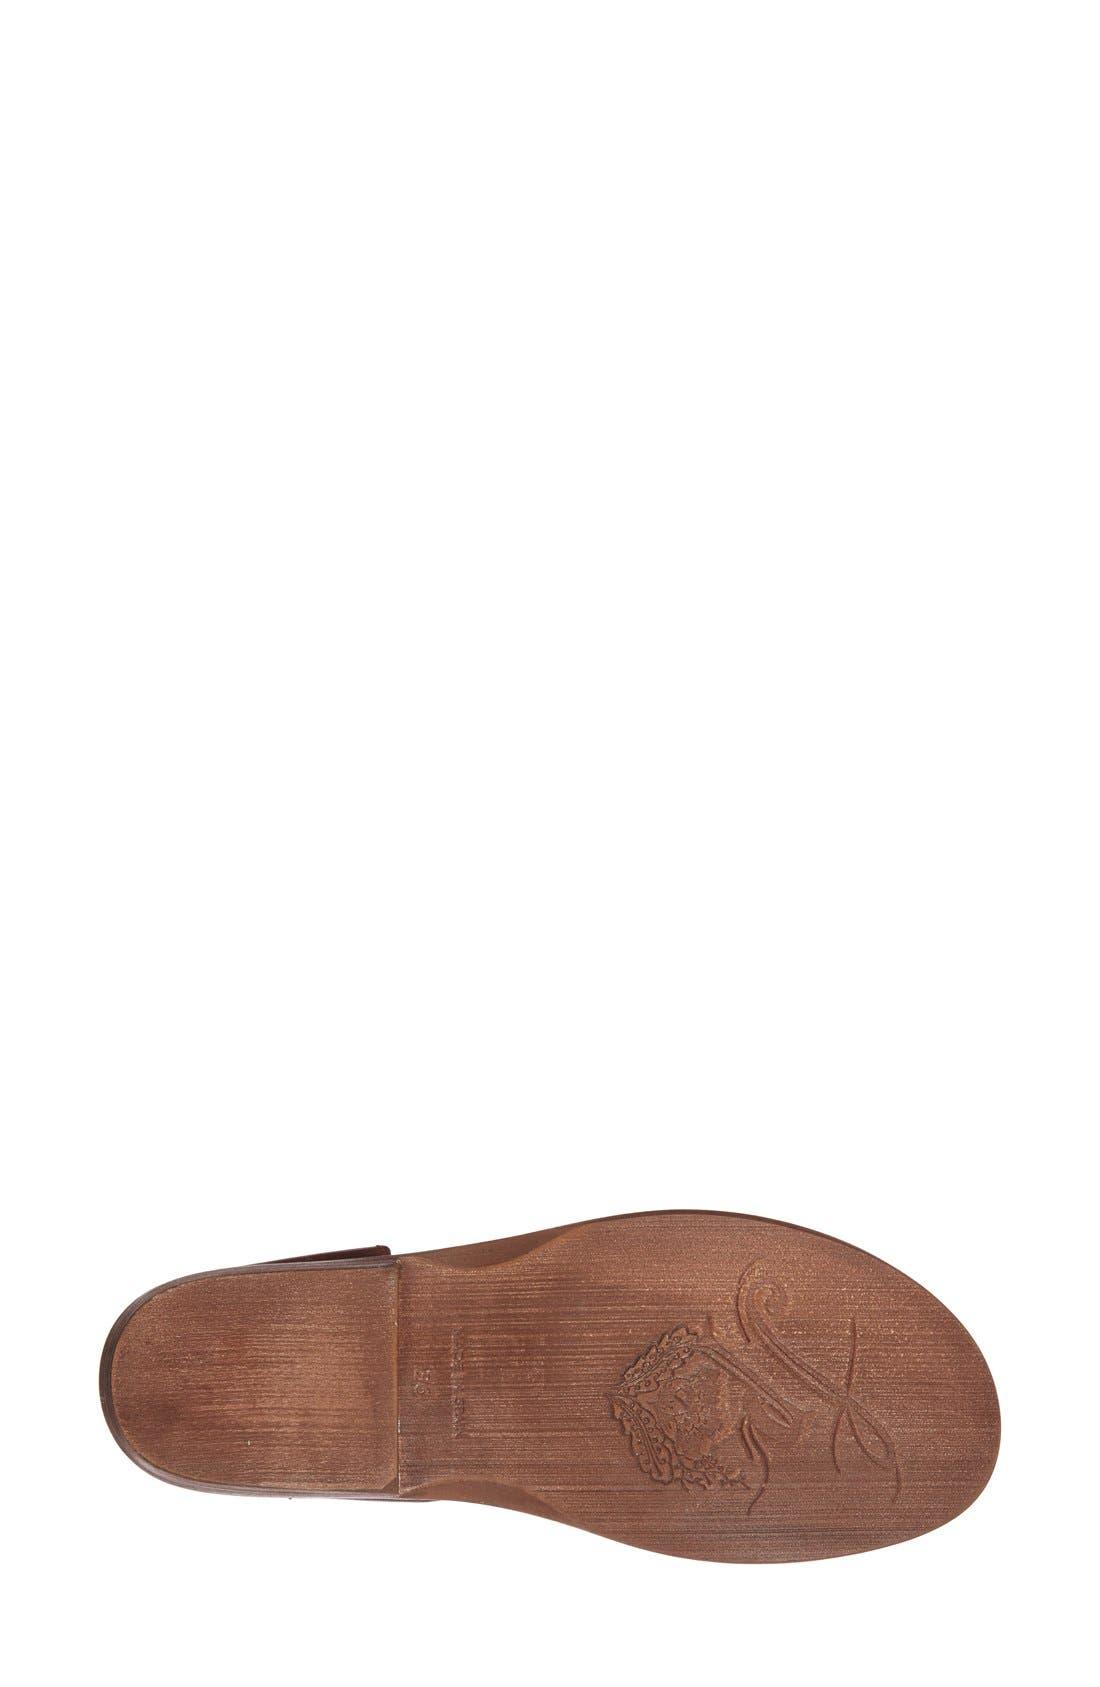 'Mont Blanc' Asymmetrical Sandal,                             Alternate thumbnail 24, color,